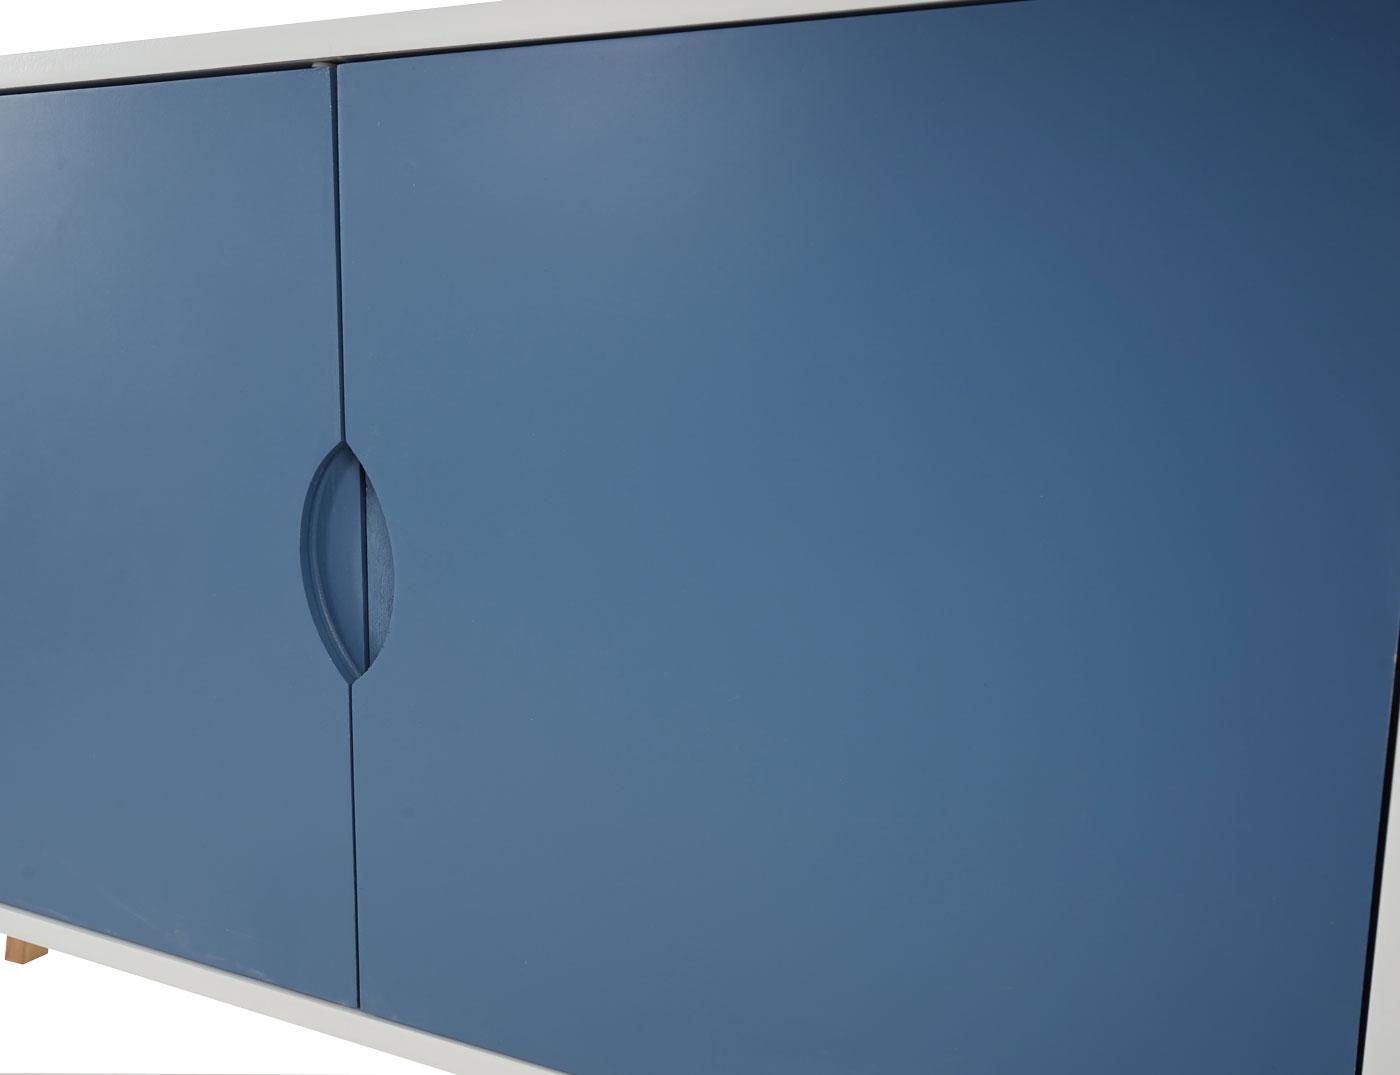 kommode malm t292 schrank retro design 70x80x40cm blaue. Black Bedroom Furniture Sets. Home Design Ideas